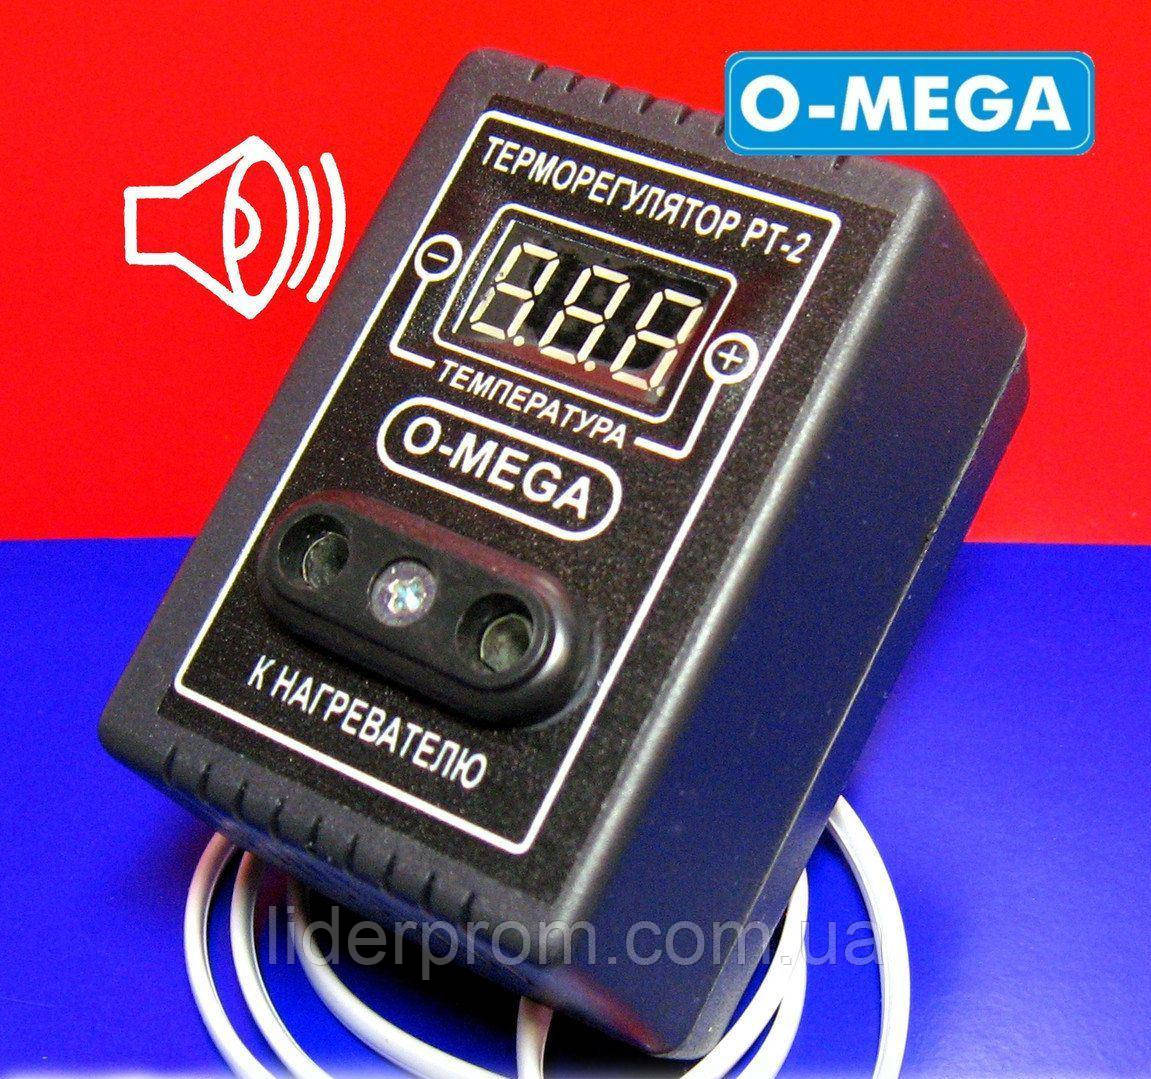 Терморегулятор для инкубатора РТ-2 Омега (O-Mega) цифровой